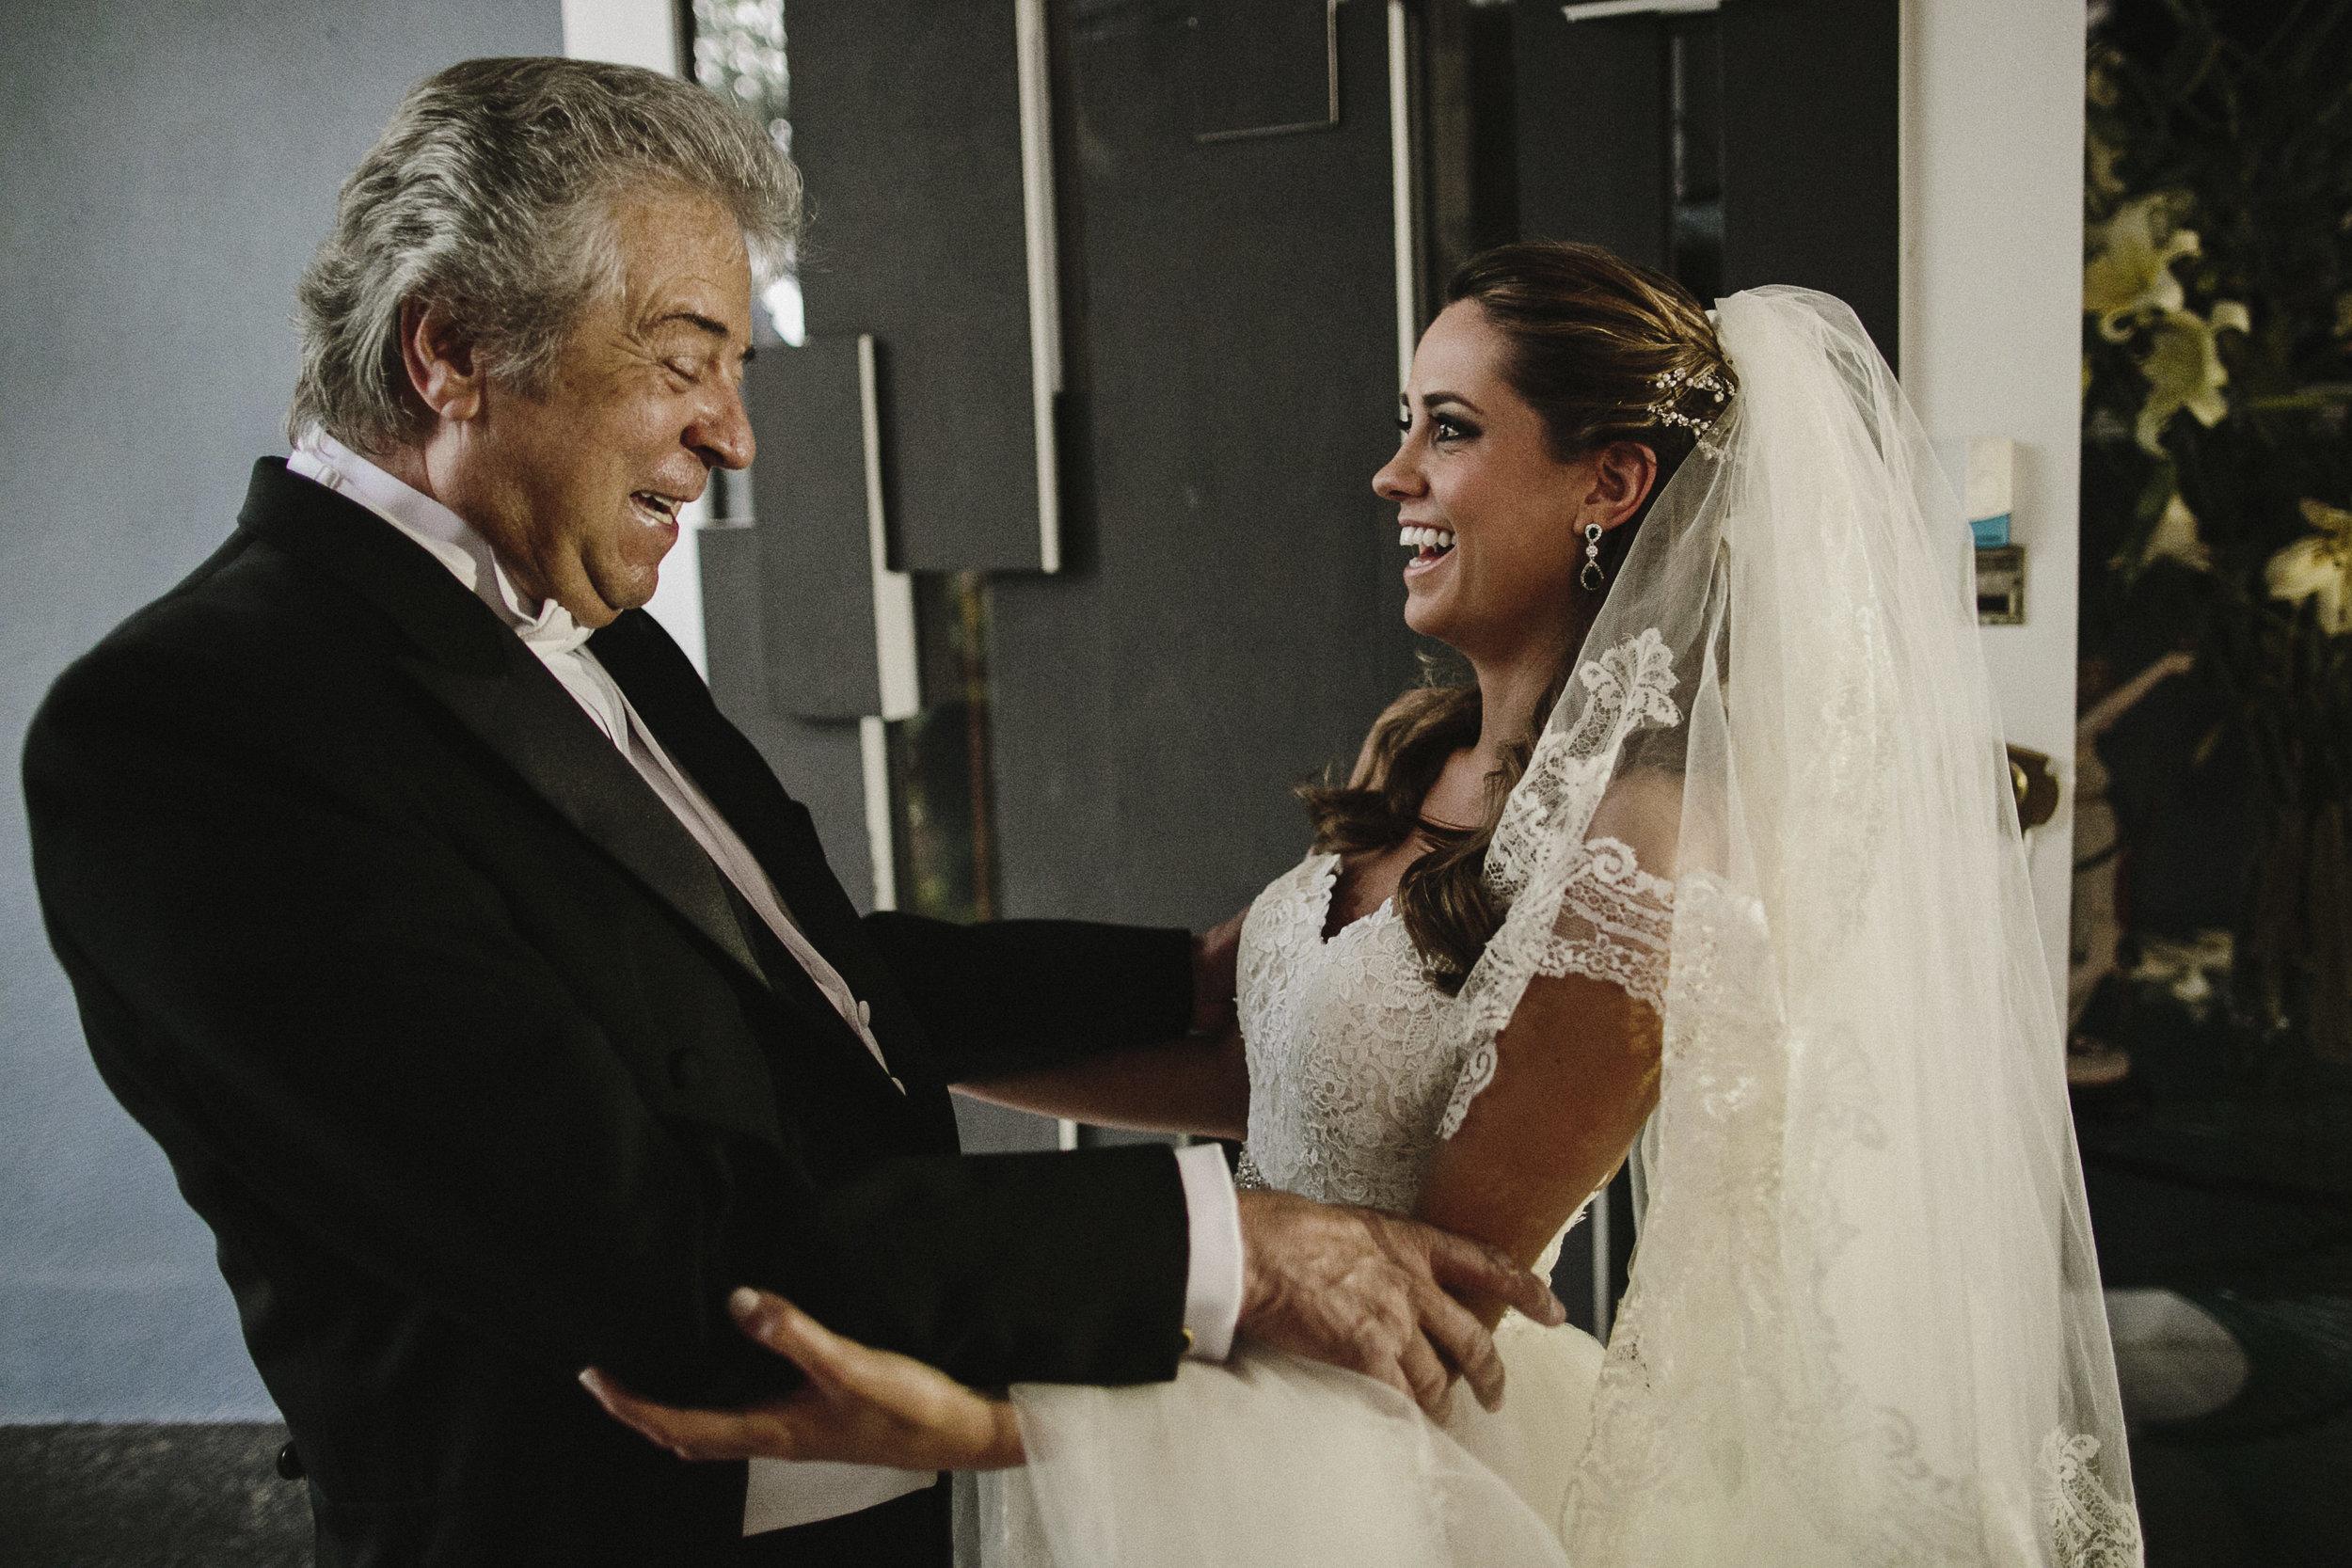 alfonso_flores_destination_wedding_photogrpahy_paola_alonso-133.JPG